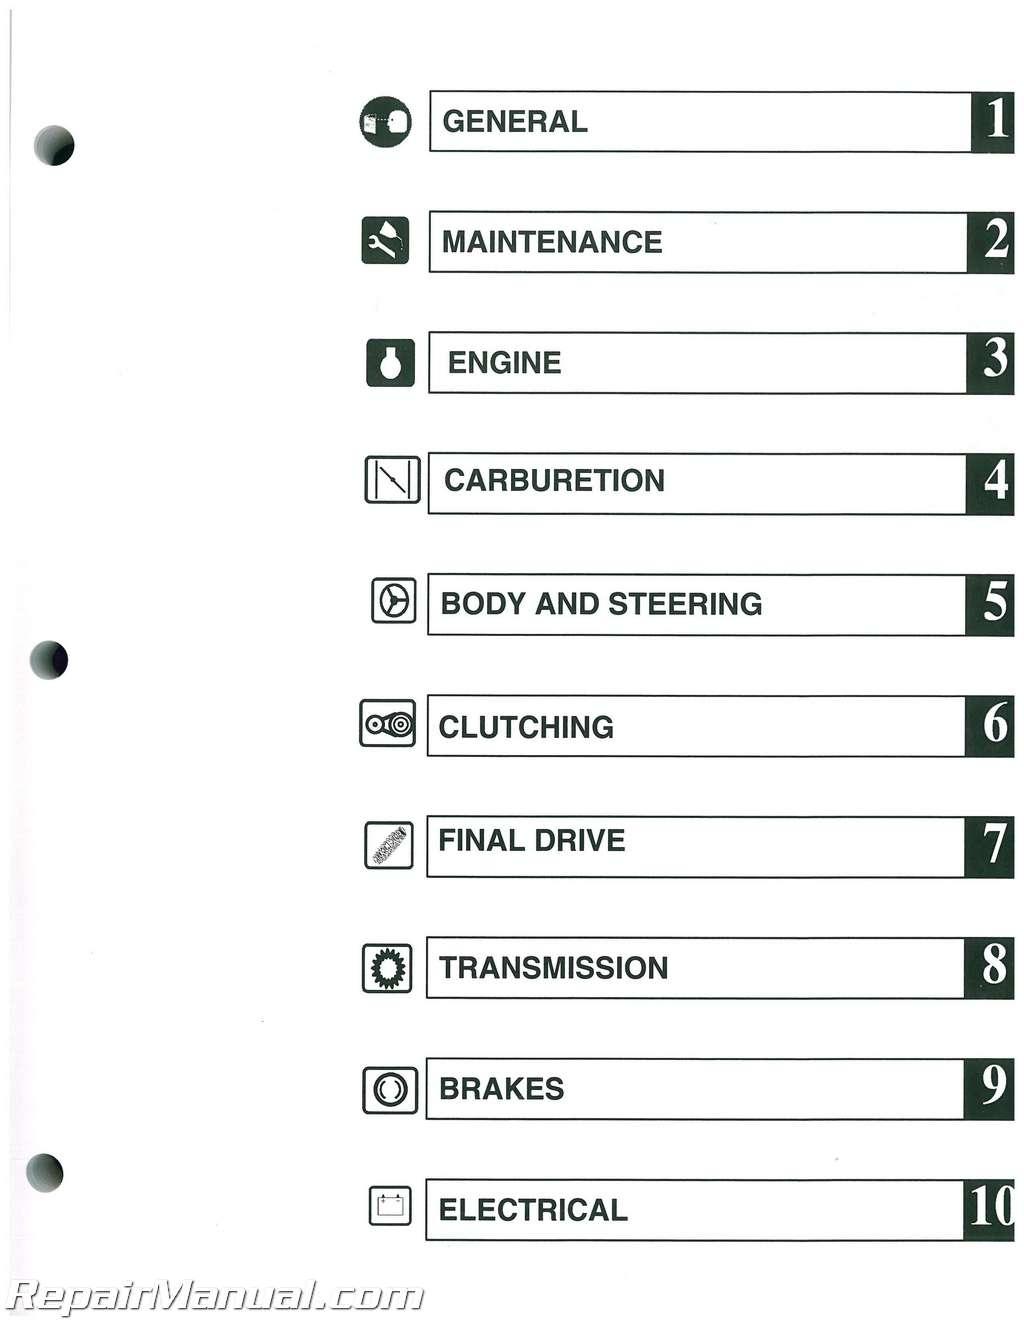 2006 Polaris Trail Boss 330 Wiring Diagram Electrical Diagrams 2000 Sportsman 500 Atv Free Download 2004 Trailboss Service Manual 2003 Ranger